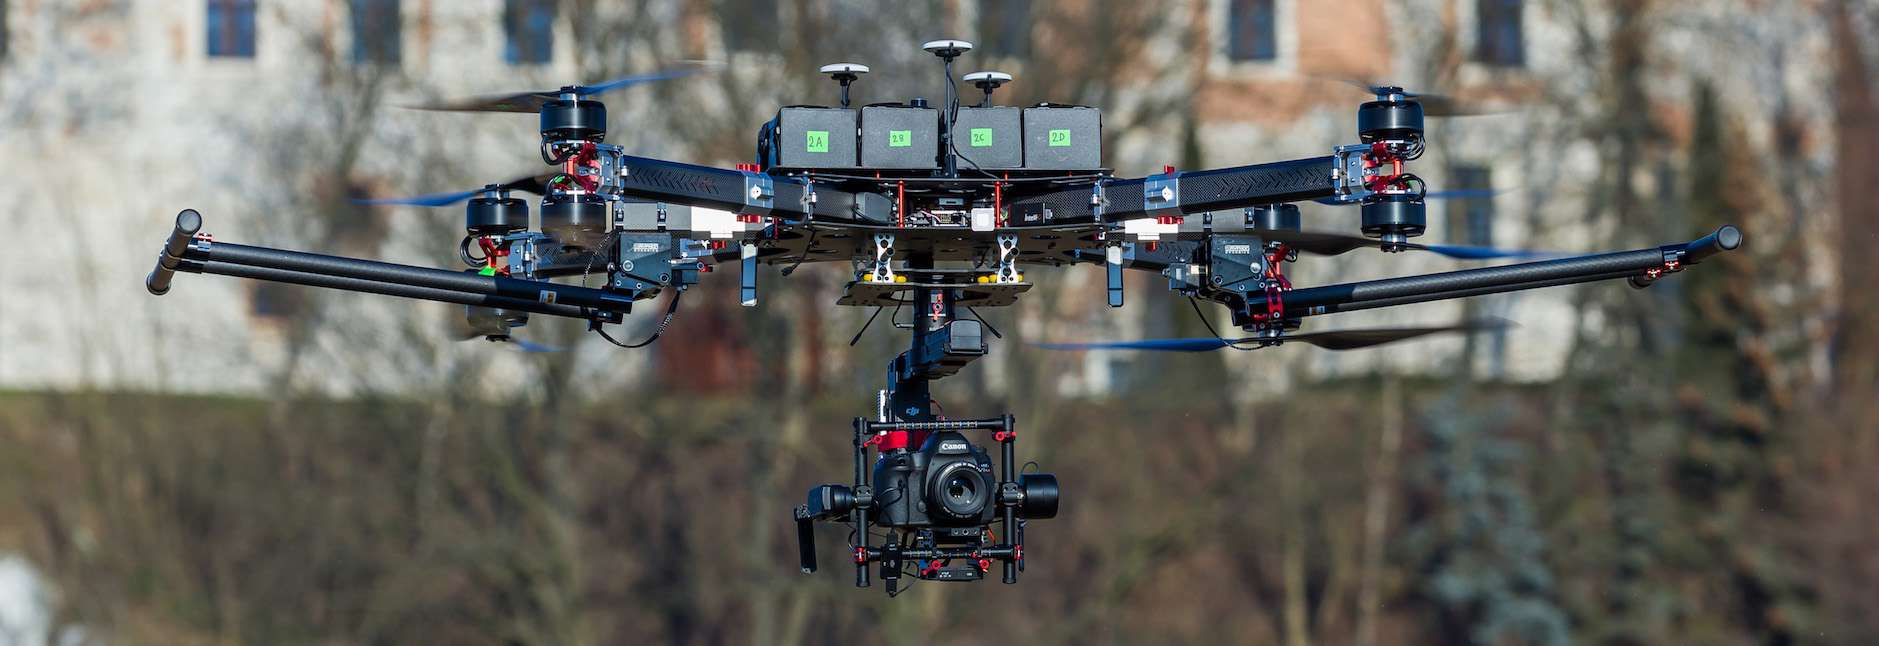 dron kraków